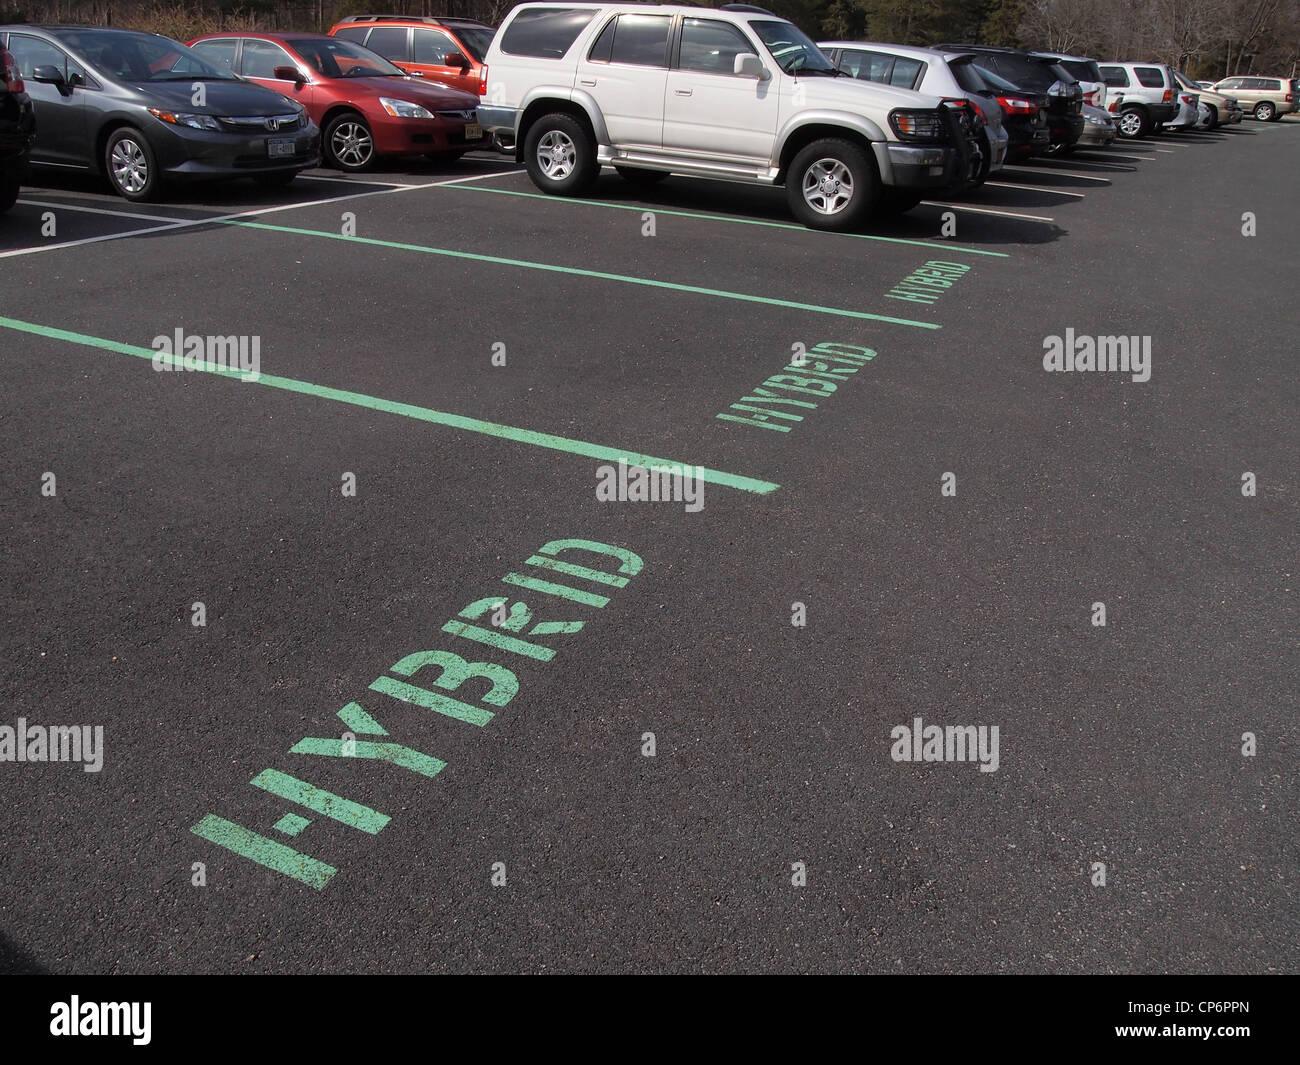 Parcheggi riservati per veicoli ibridi, New York, Stati Uniti, 8 marzo 2012, © Katharine Andriotis Immagini Stock